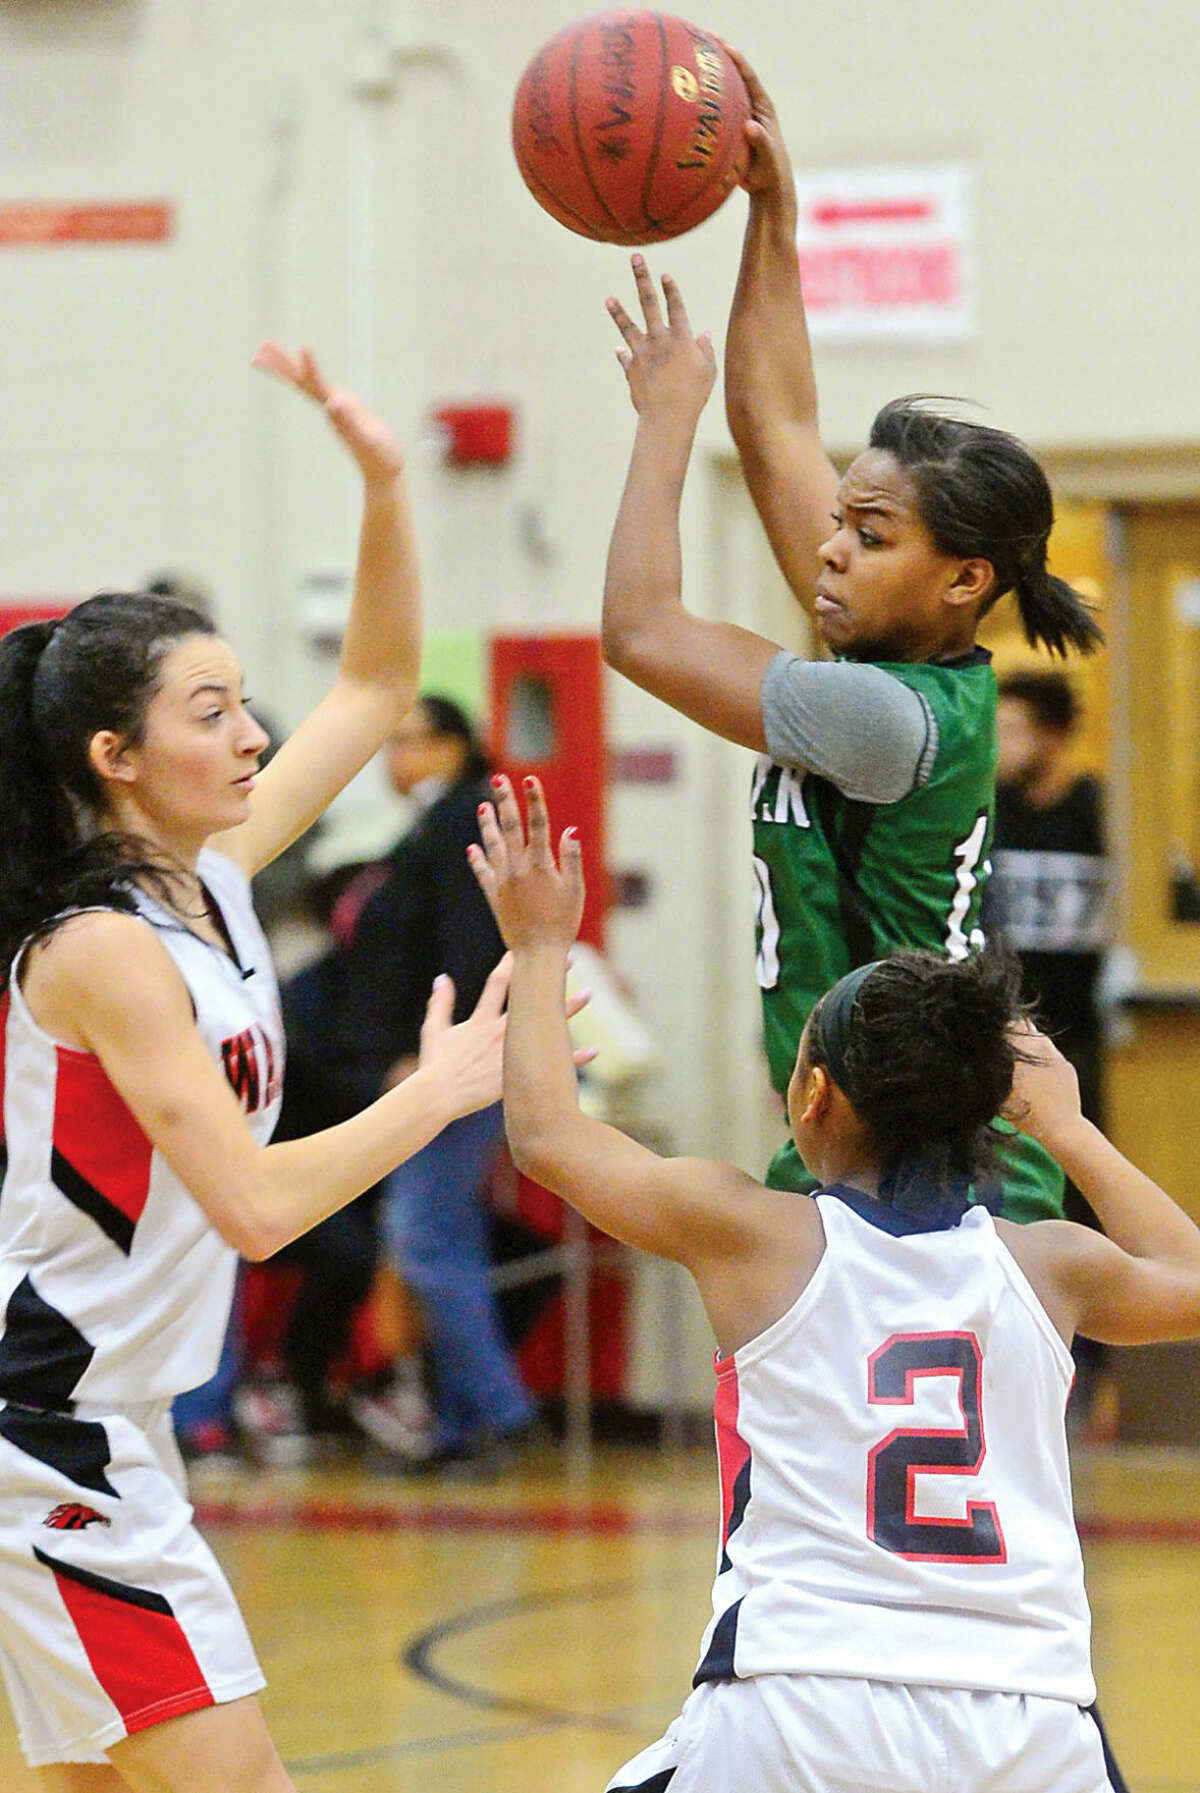 Hour photo / Erik Trautmann Norwalk High School Girls Basketball player #10 Jacqueline Harris looks to pass over Fairifeld Warde in the FCIAC quarter finals Saturday in Fairfield.